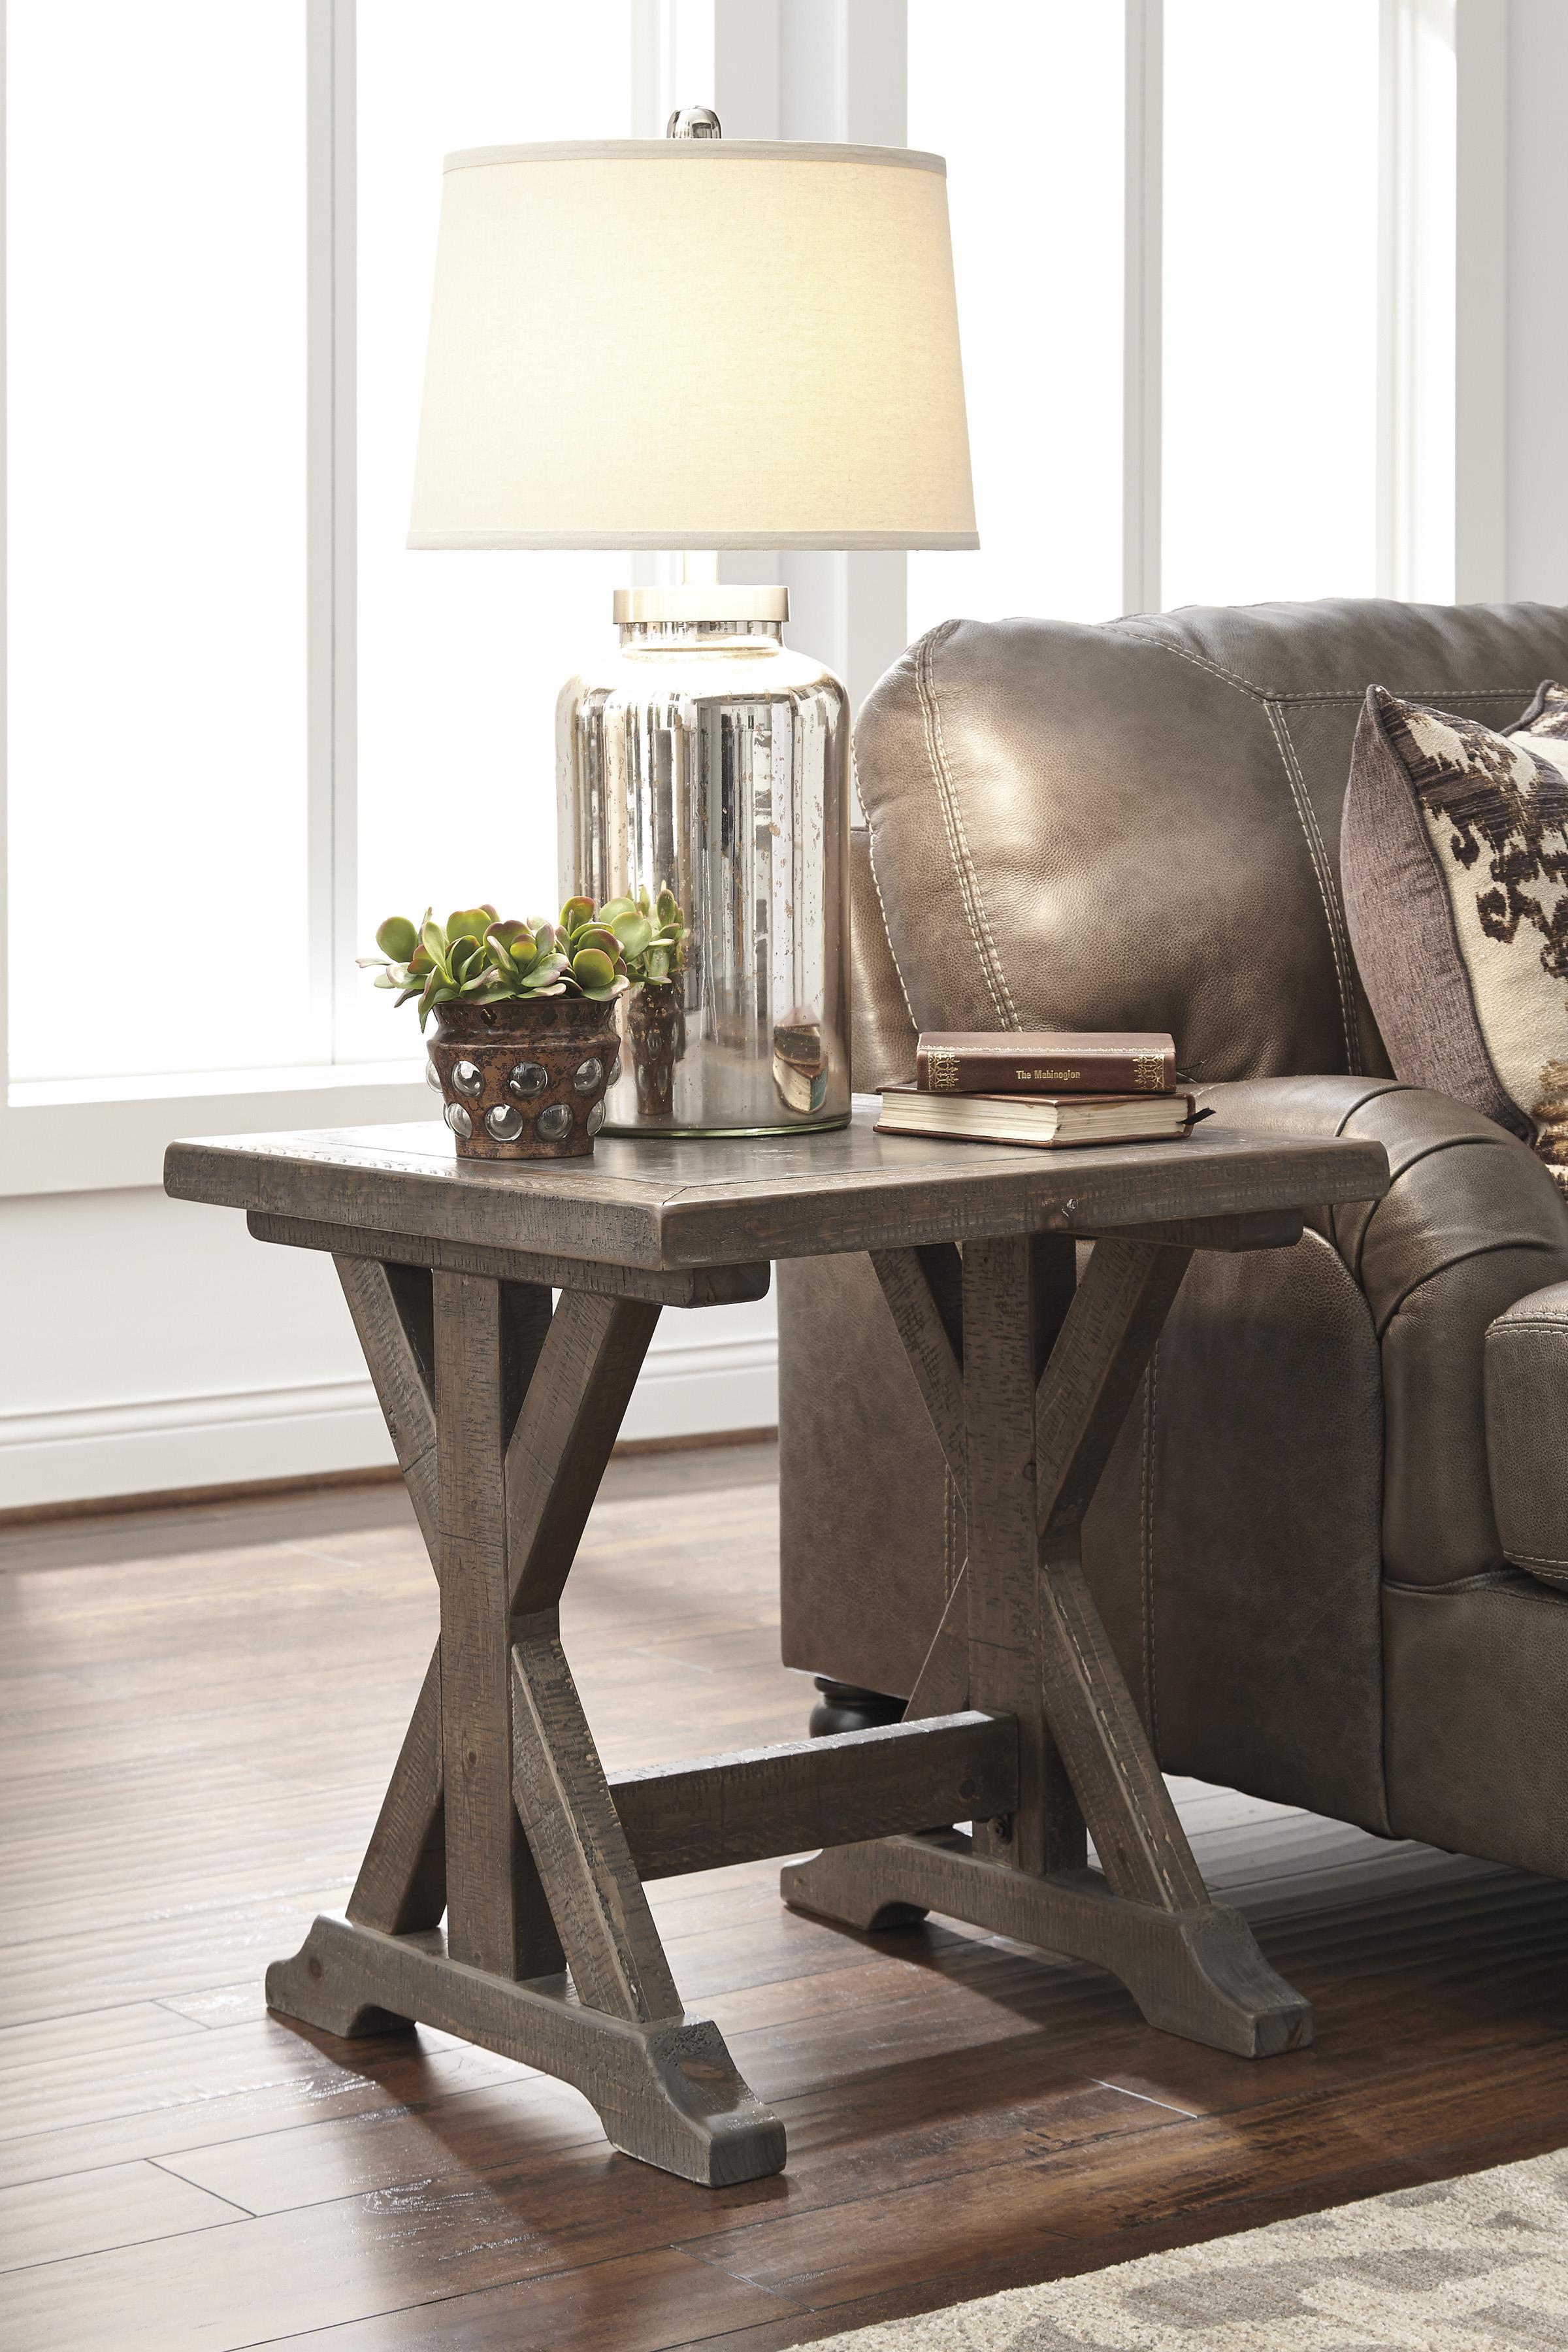 Shop By Style Del Sol Furniture Phoenix Glendale Tempe Scottsdale Avondale Peoria